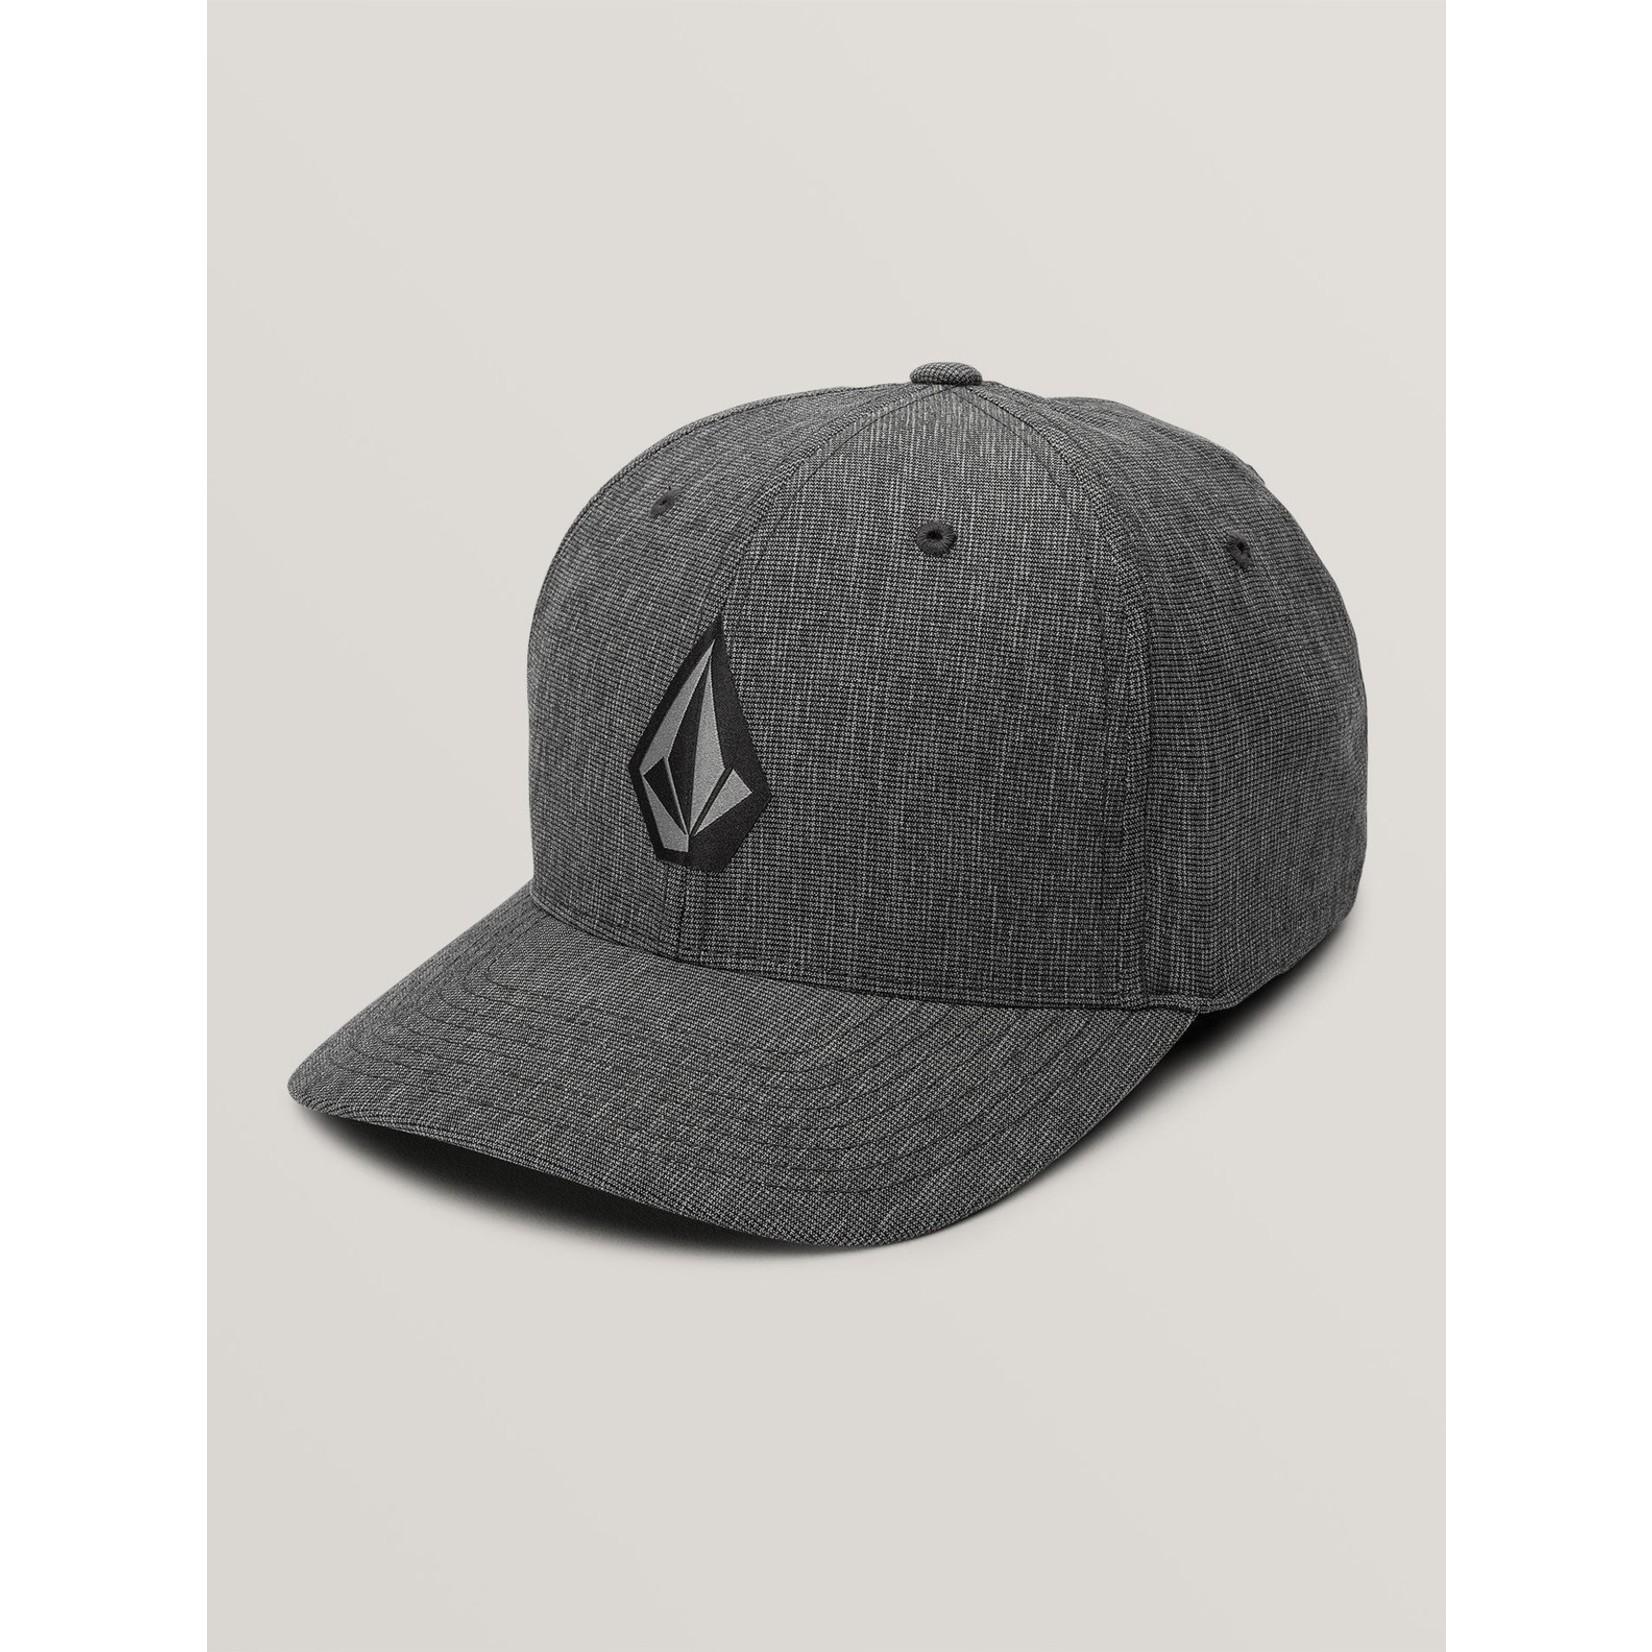 VOLCOM STONE TECH XFIT HAT